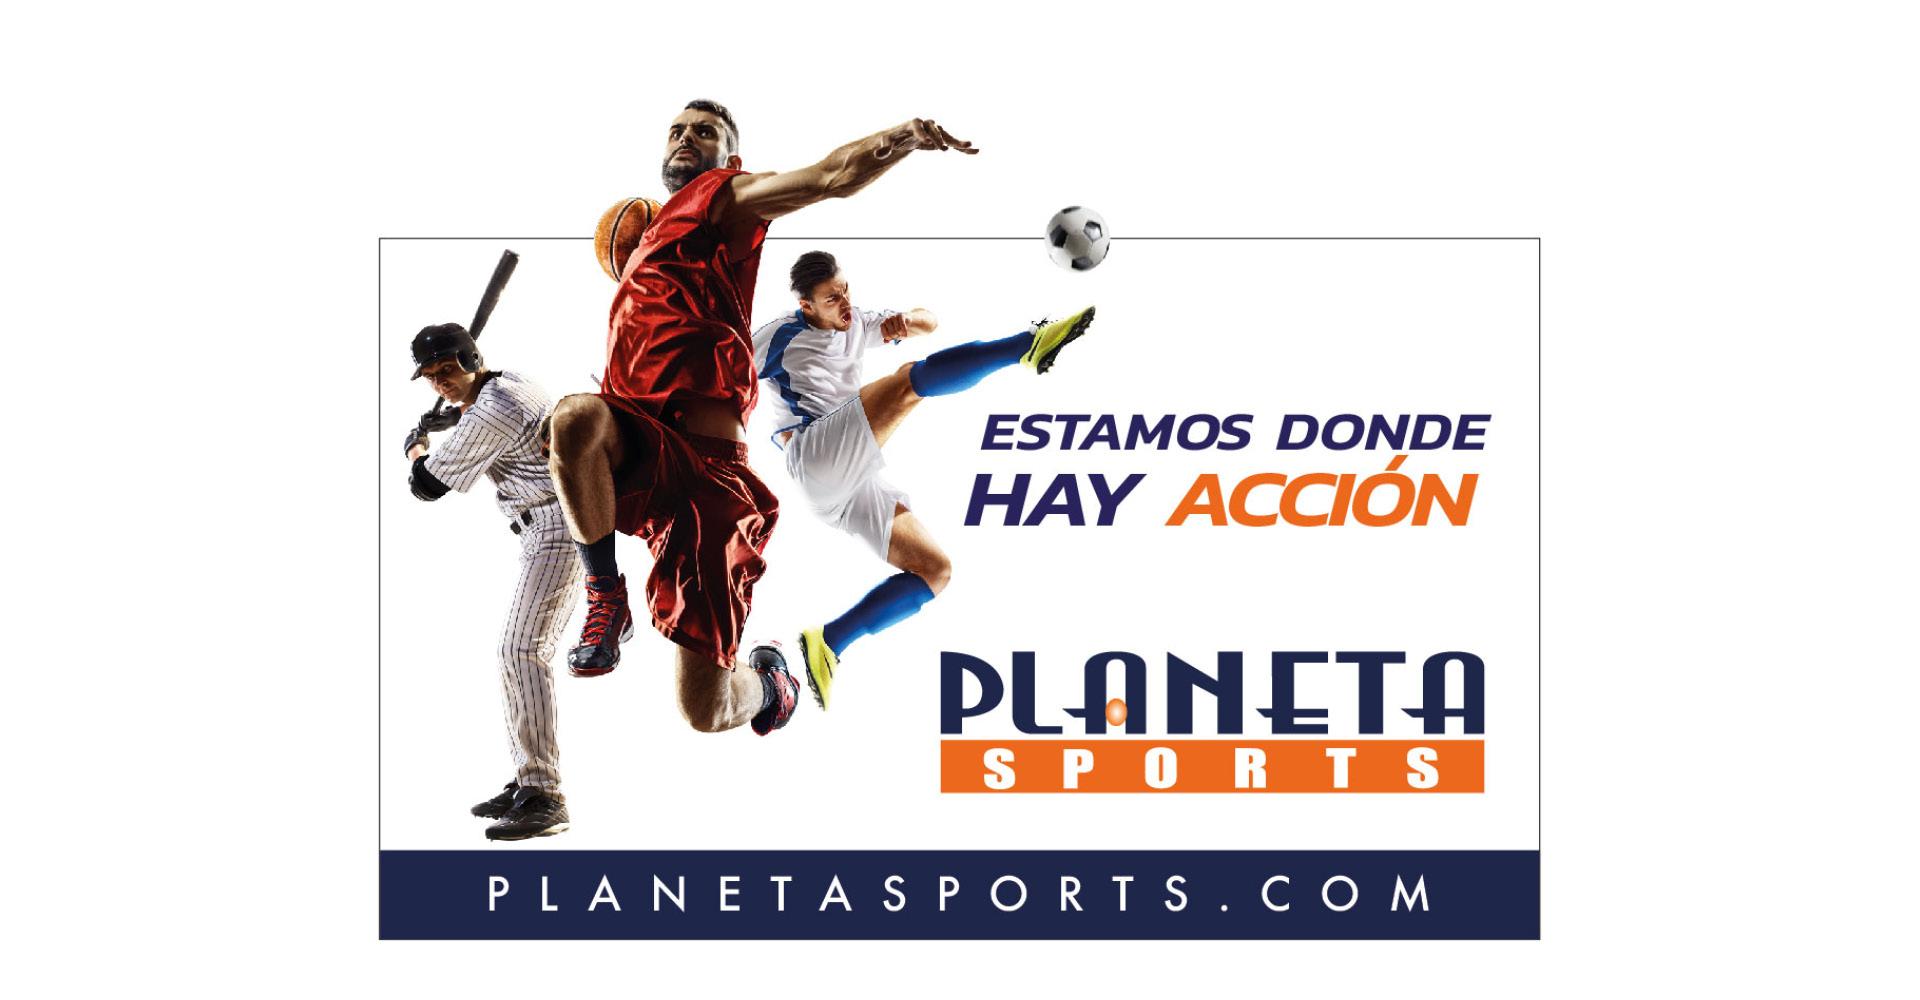 Planeta Sports